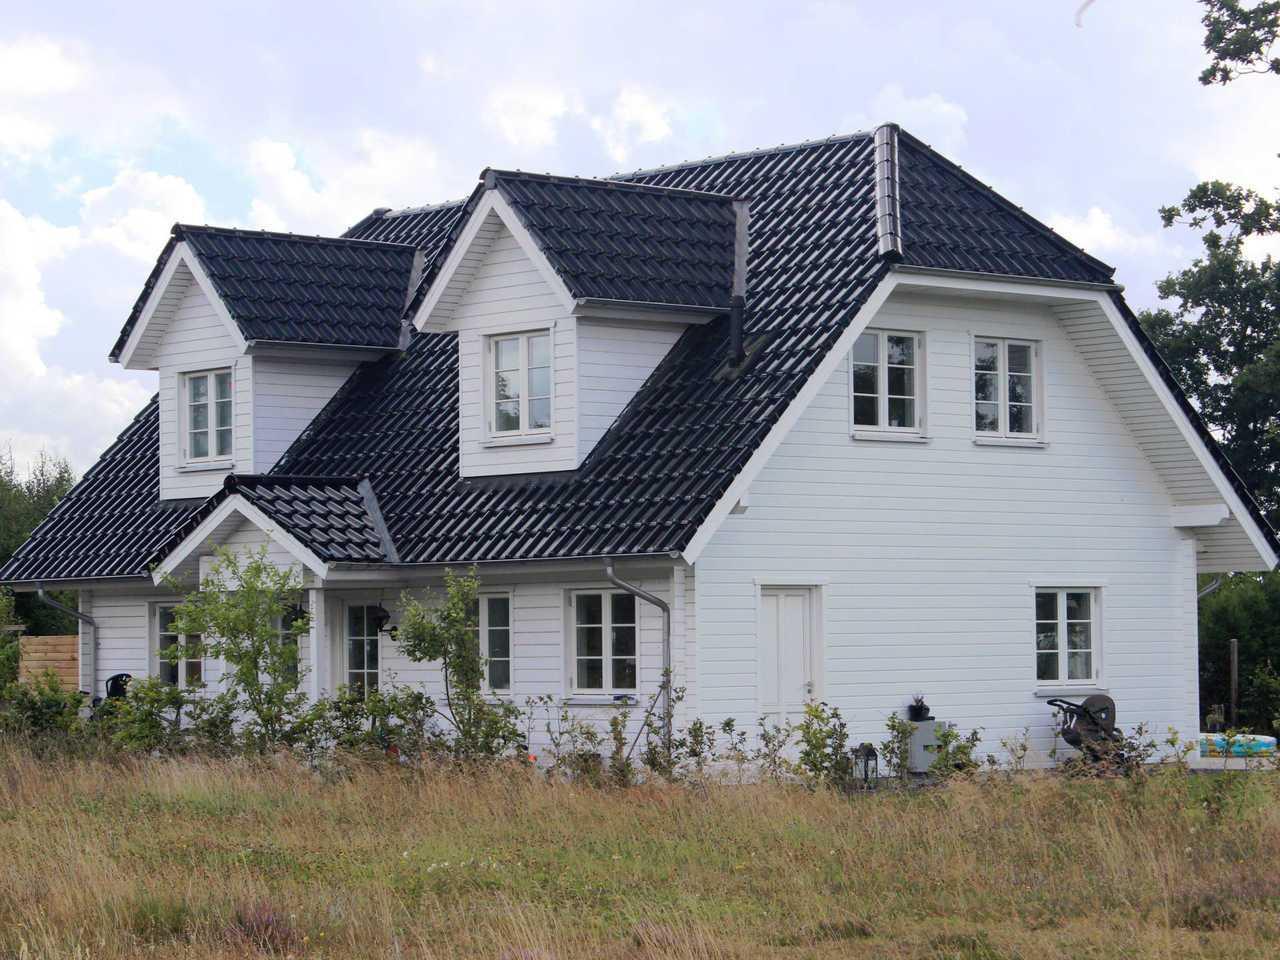 Helsingör Holzhaus Fjorborg Häuser Ansicht 3